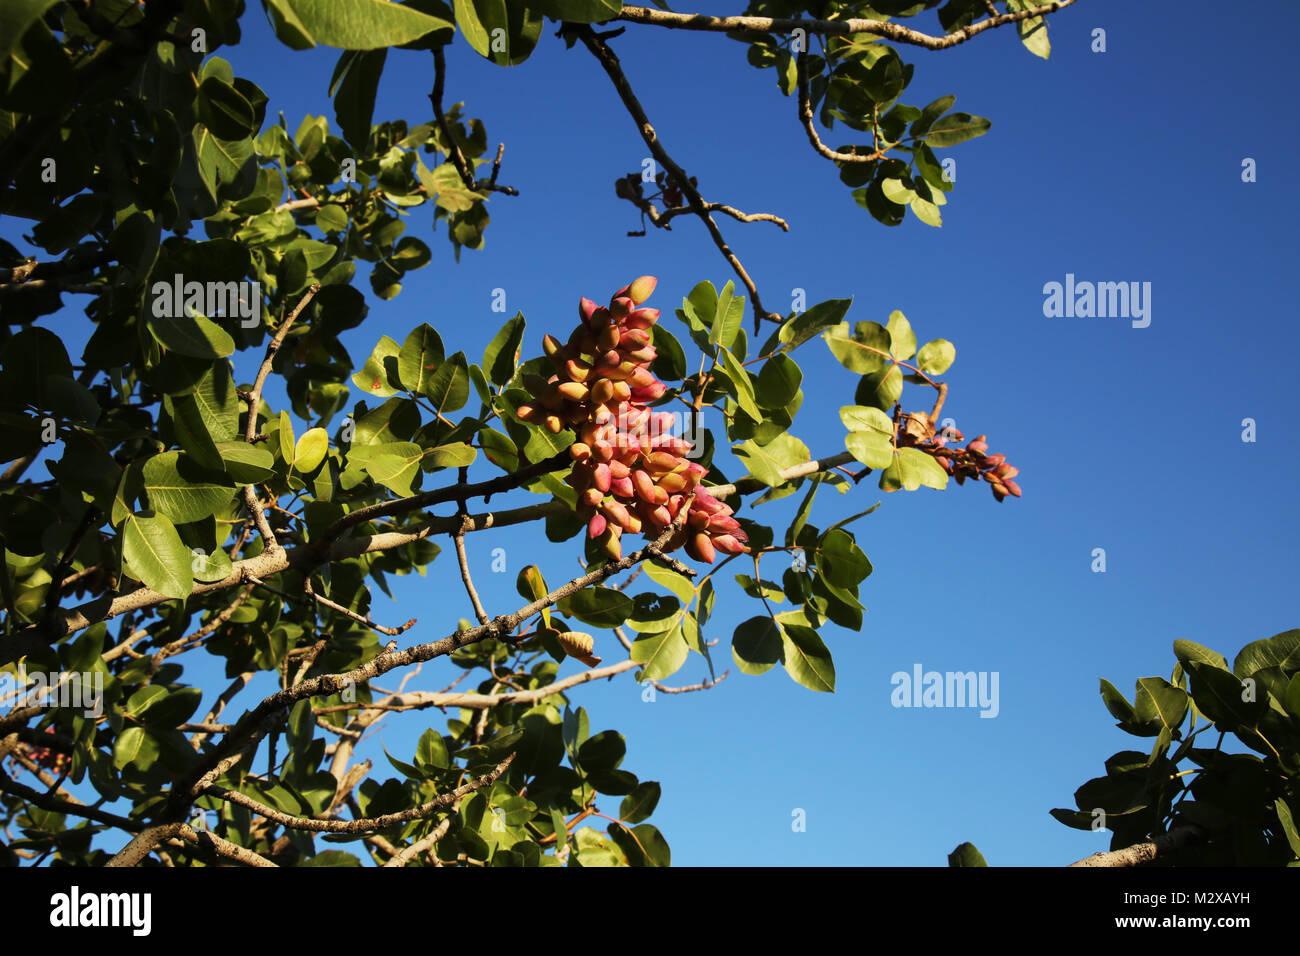 Male /& Female 2 Antep Pistachio tree